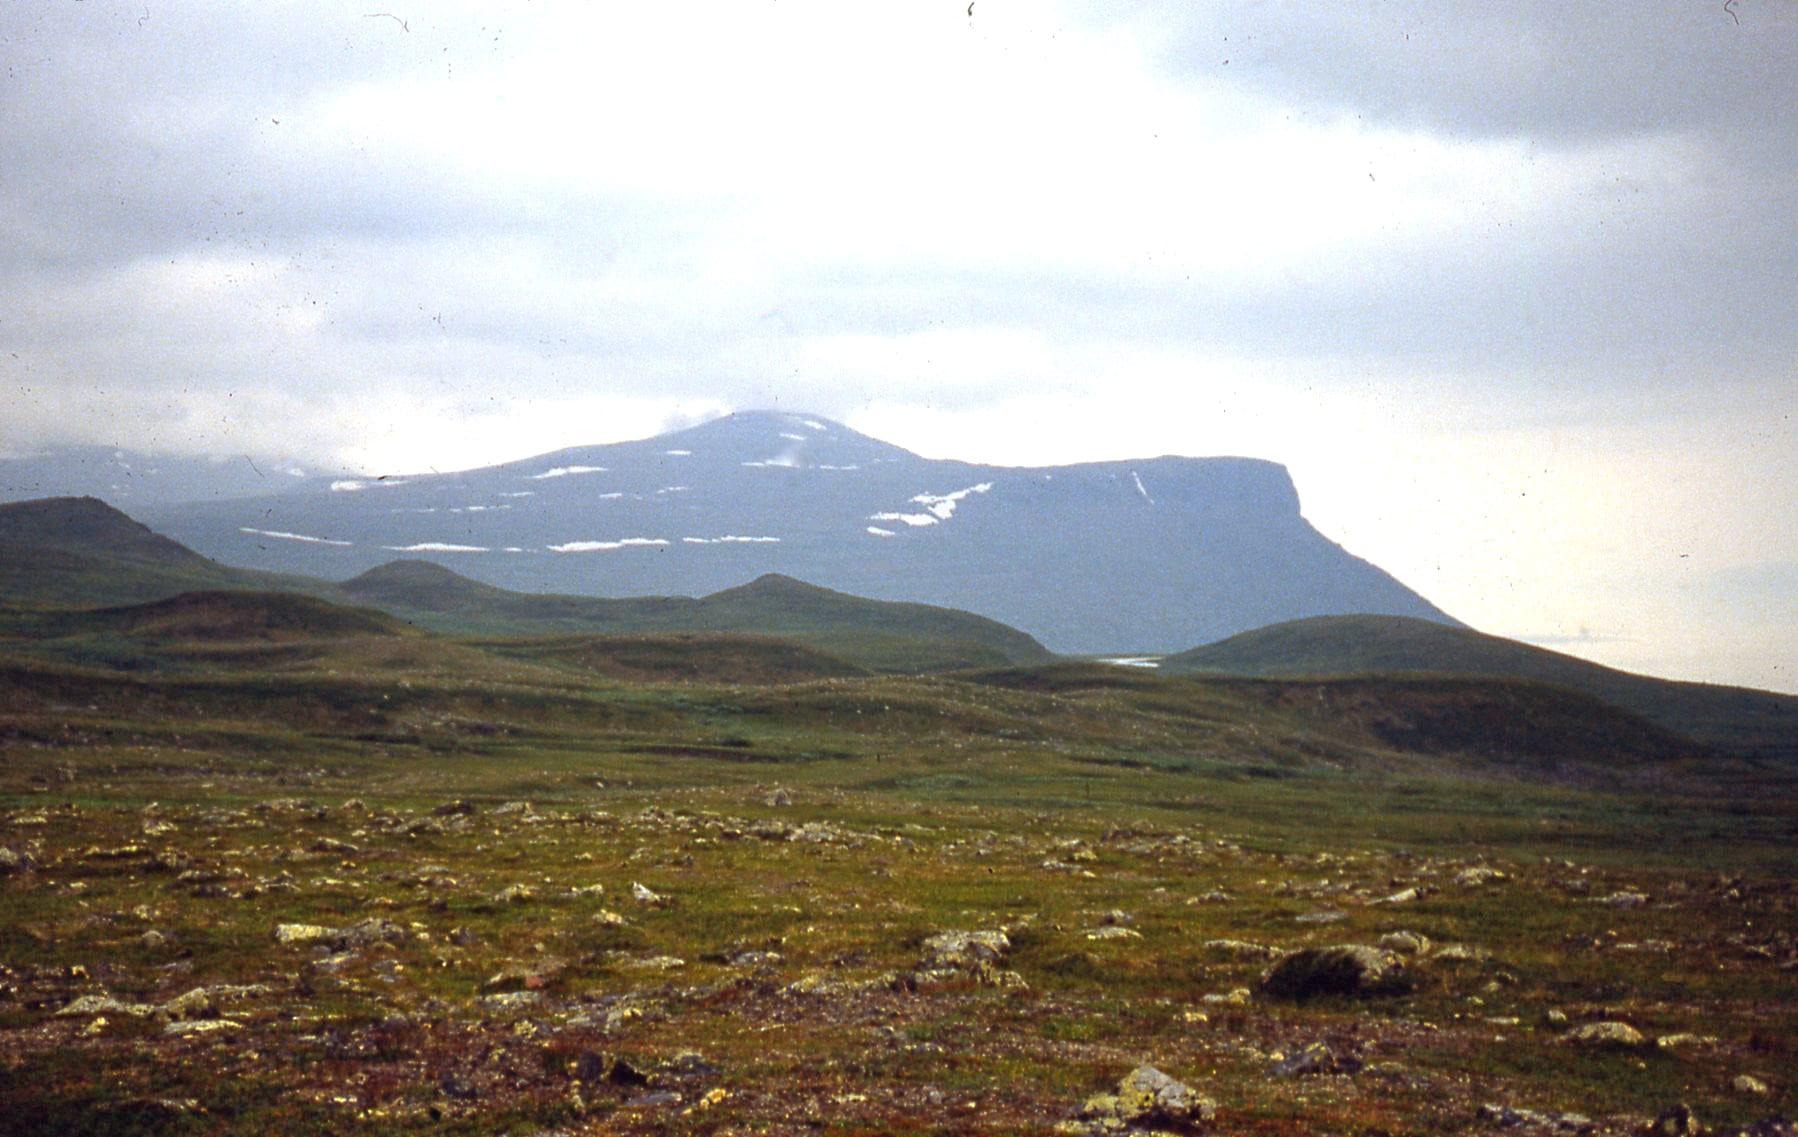 tundra in Sweden